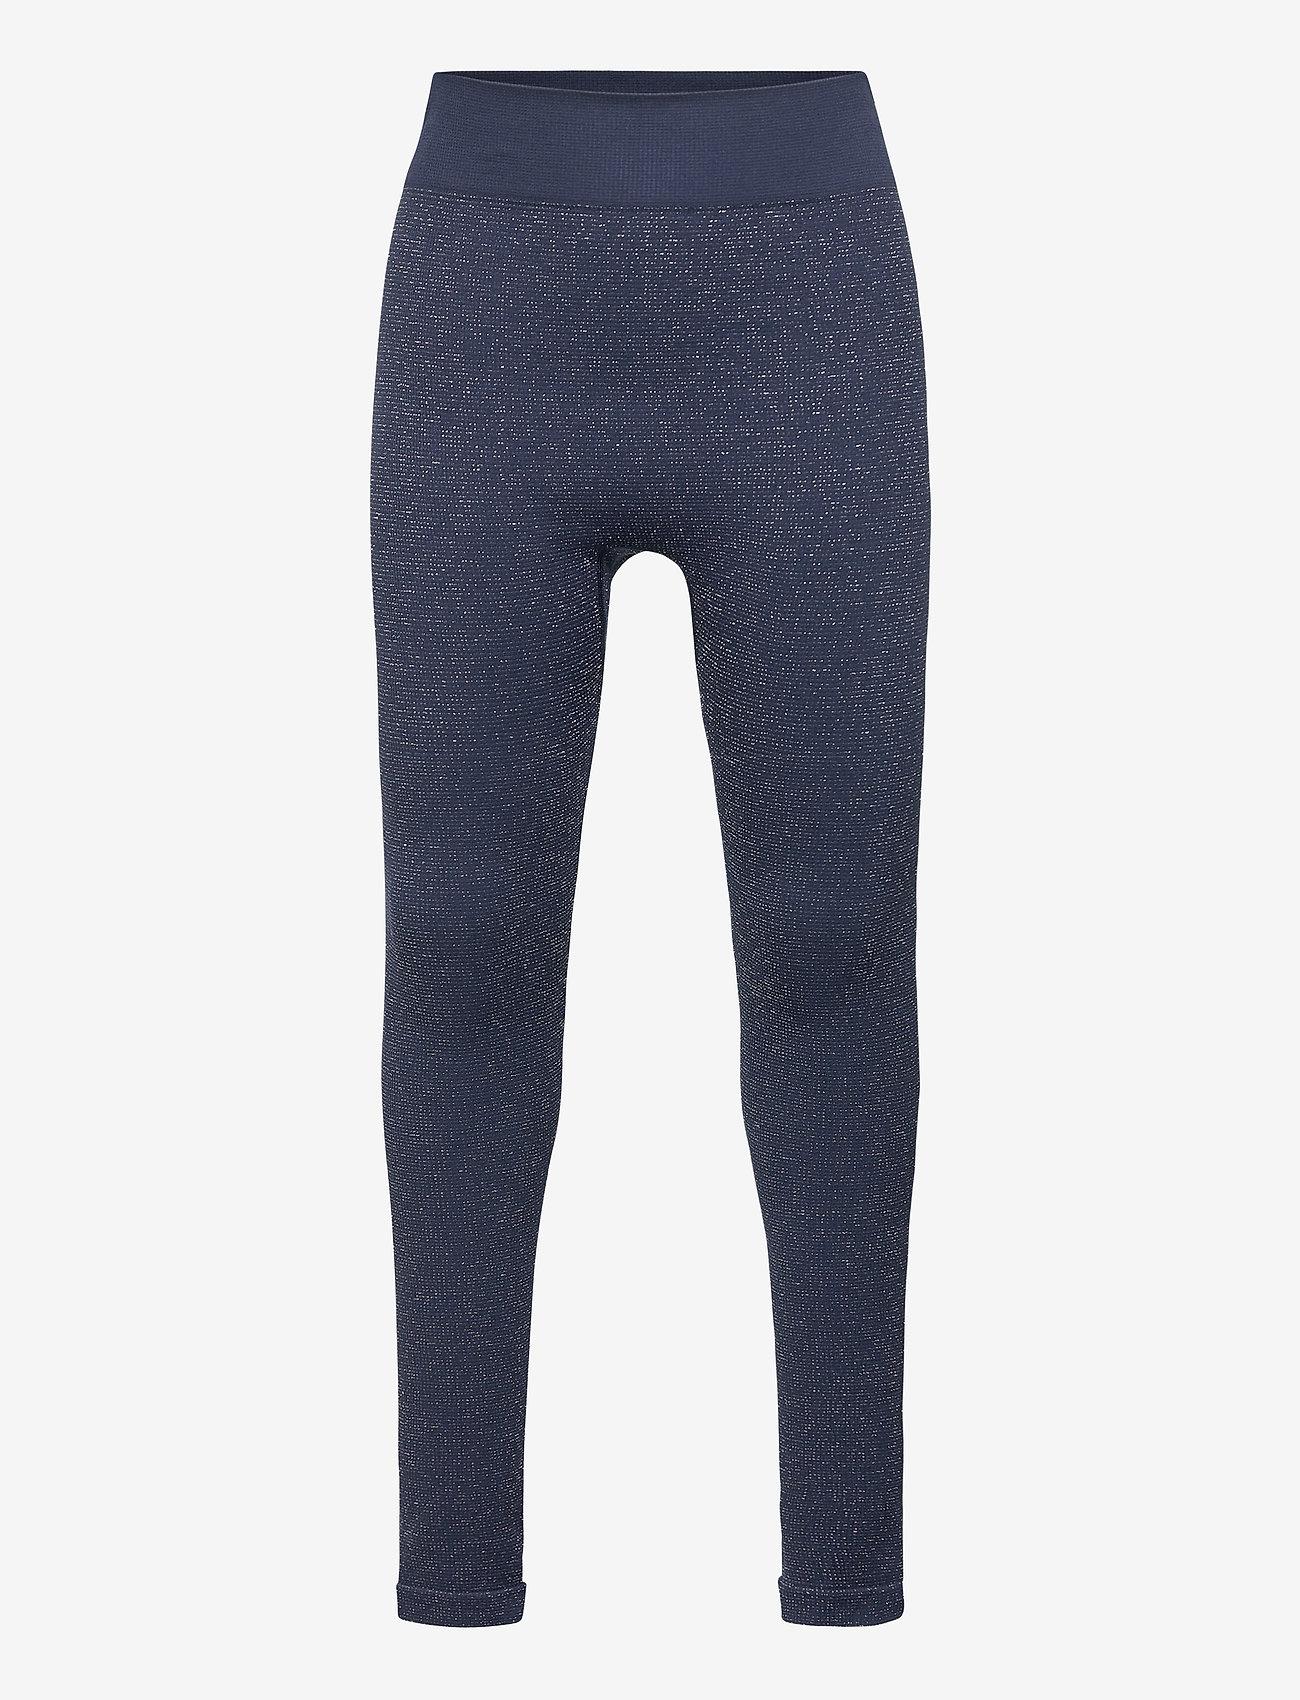 Hummel - hmlJULIA SEAMLESS TIGHTS - leggings - black iris - 0